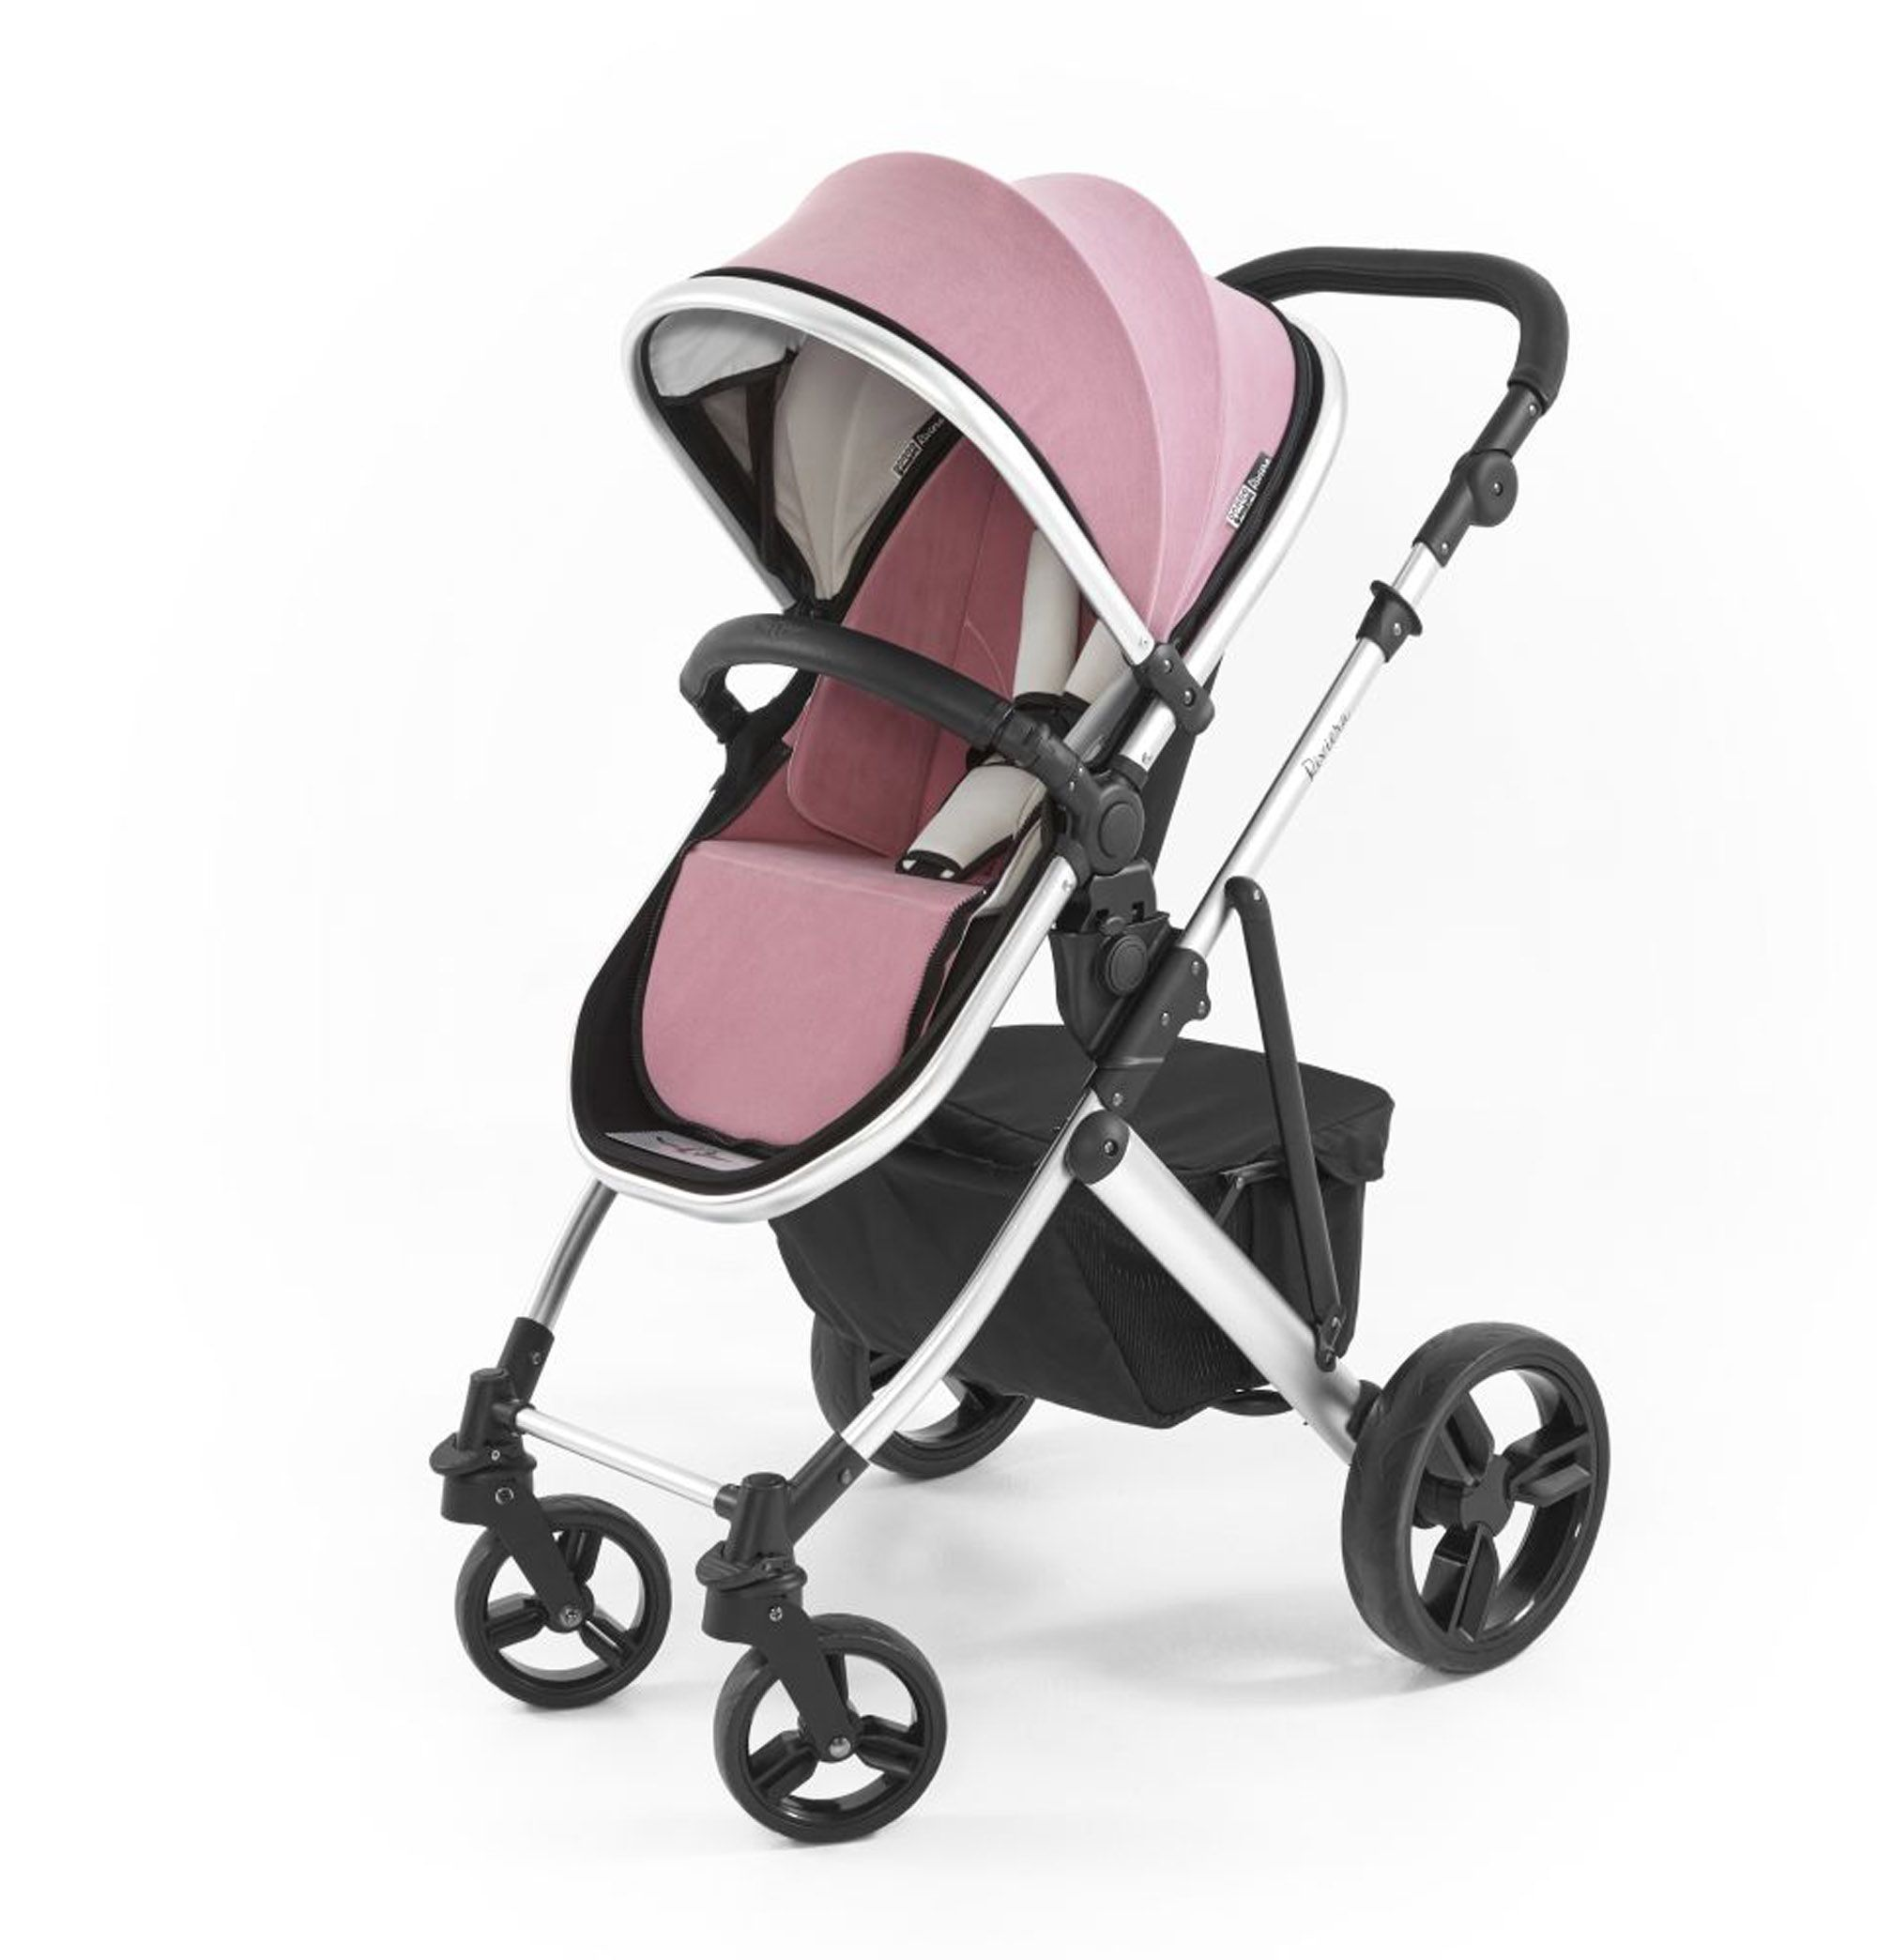 Tutti Bambini Riviera Plus 2 in 1 Silver Pushchair Dusty